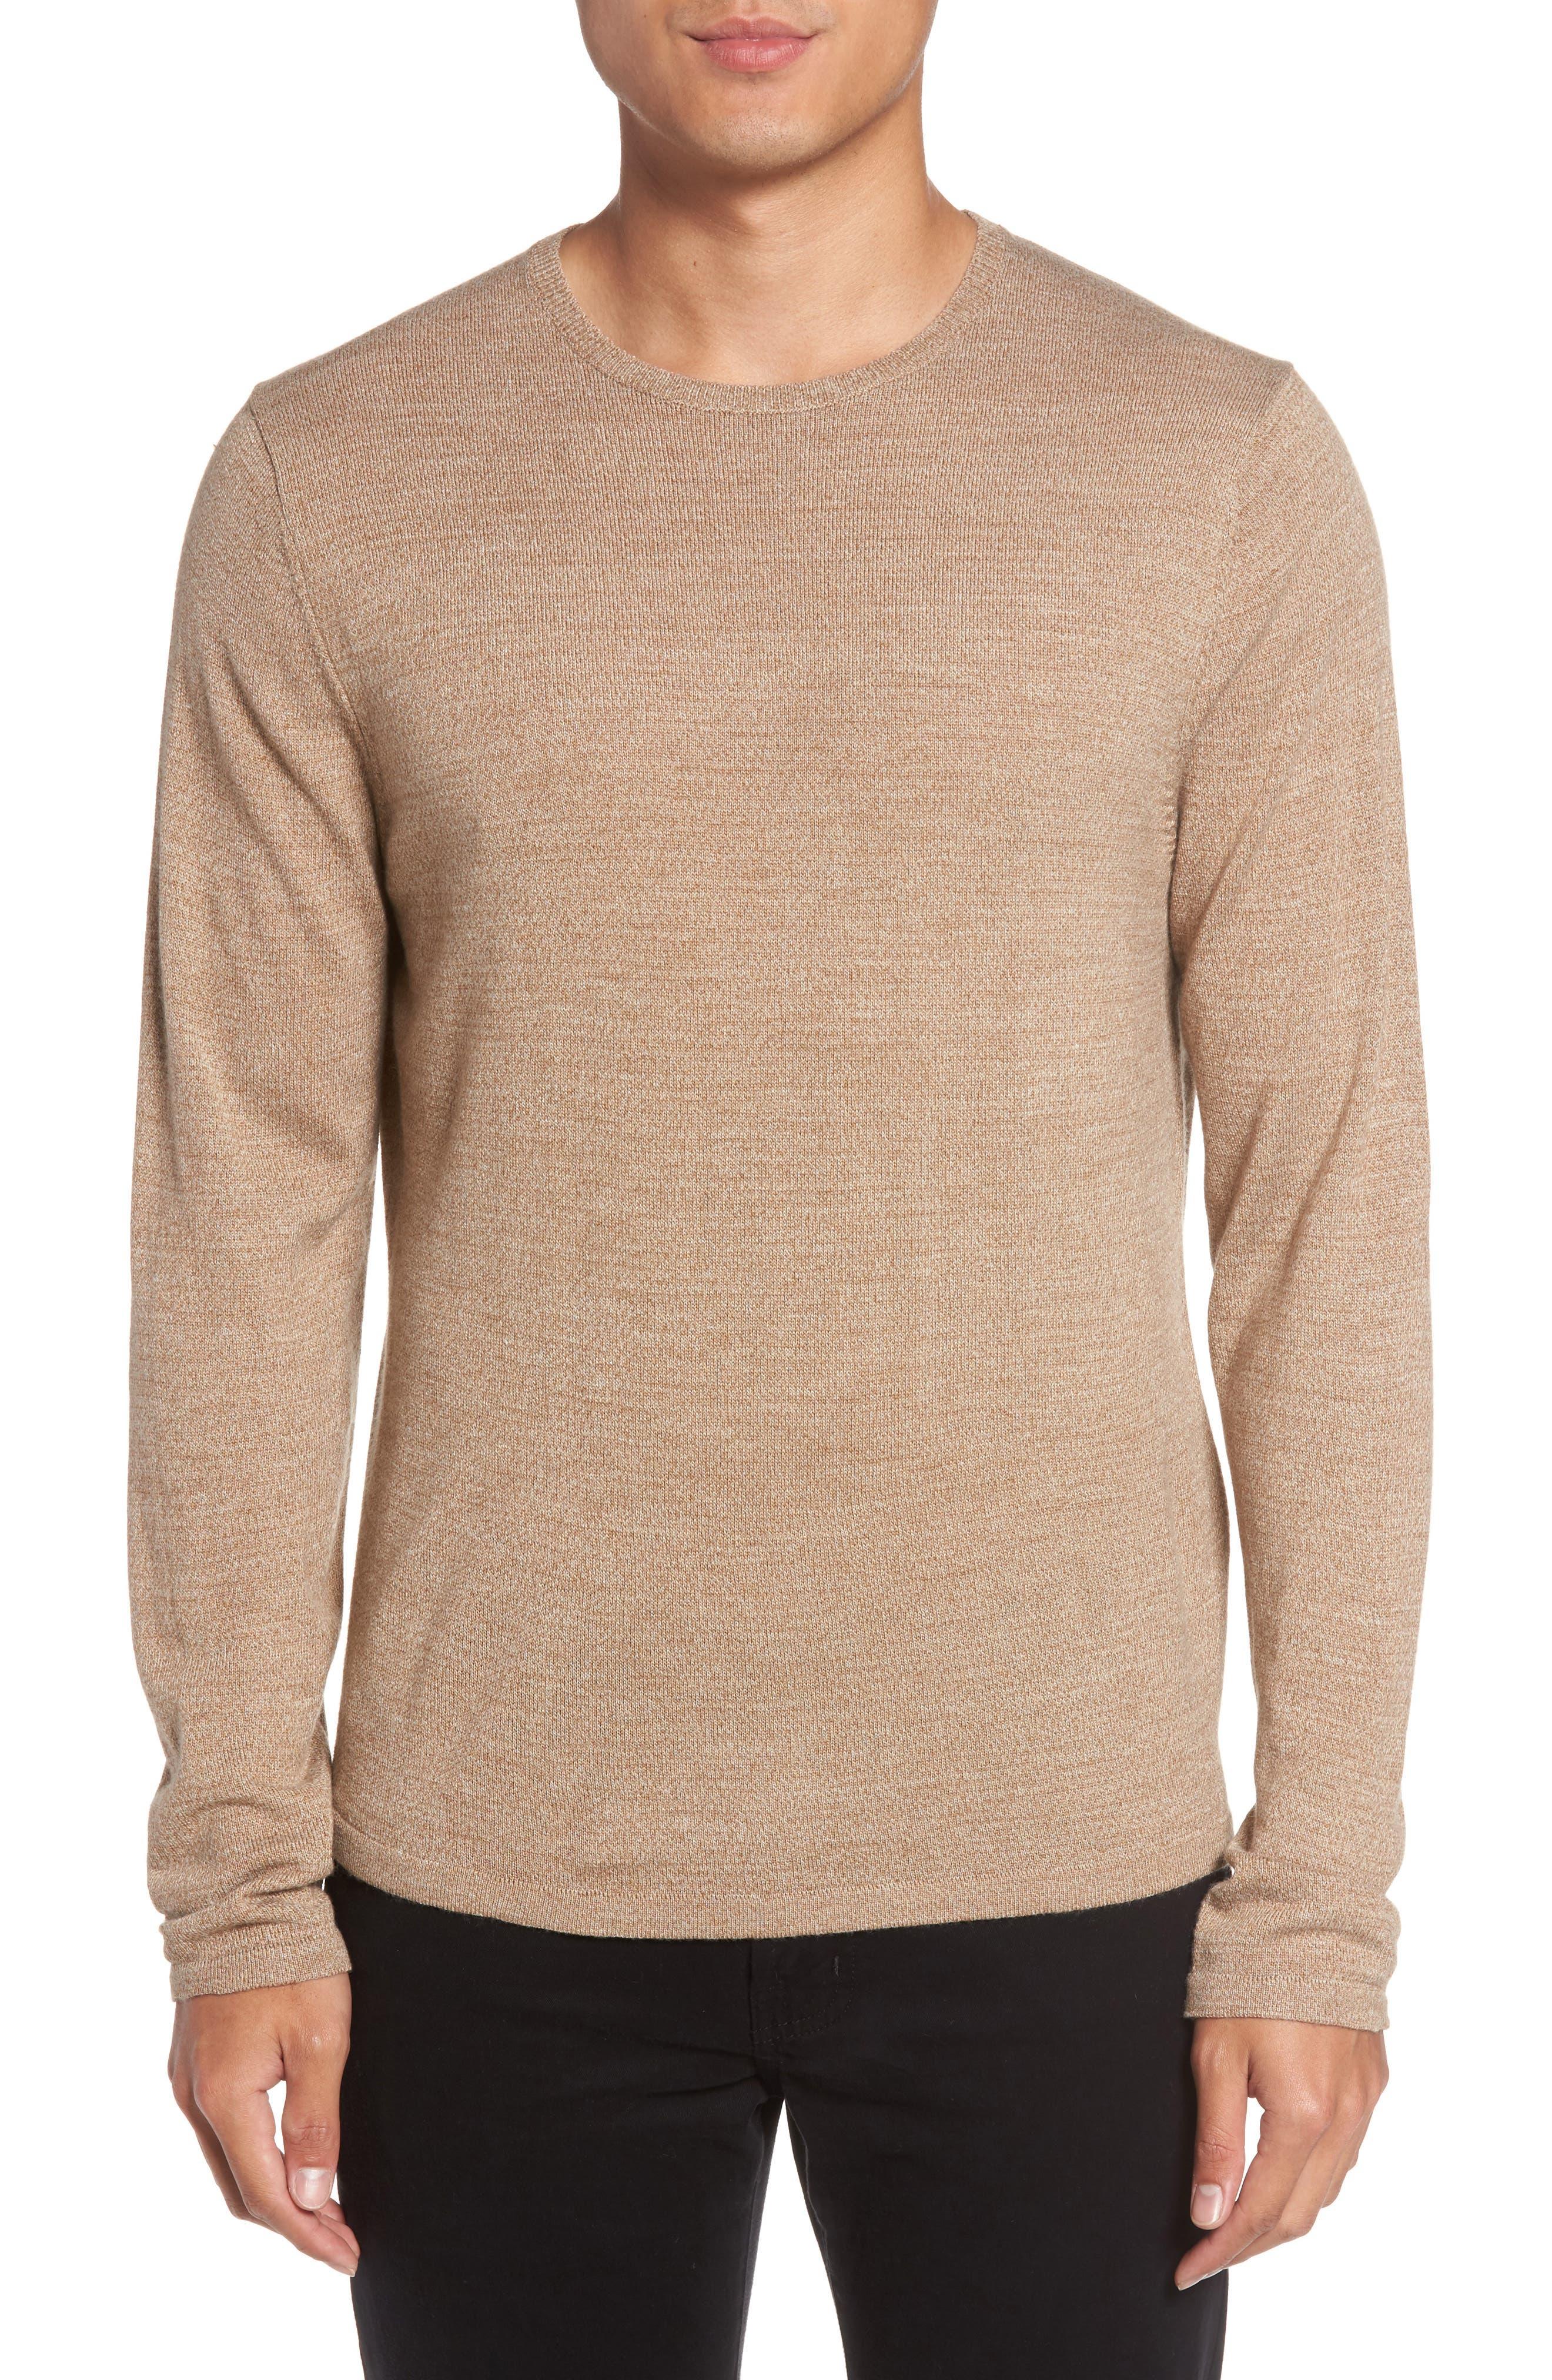 Calibrate Merino Blend Crewneck Sweater